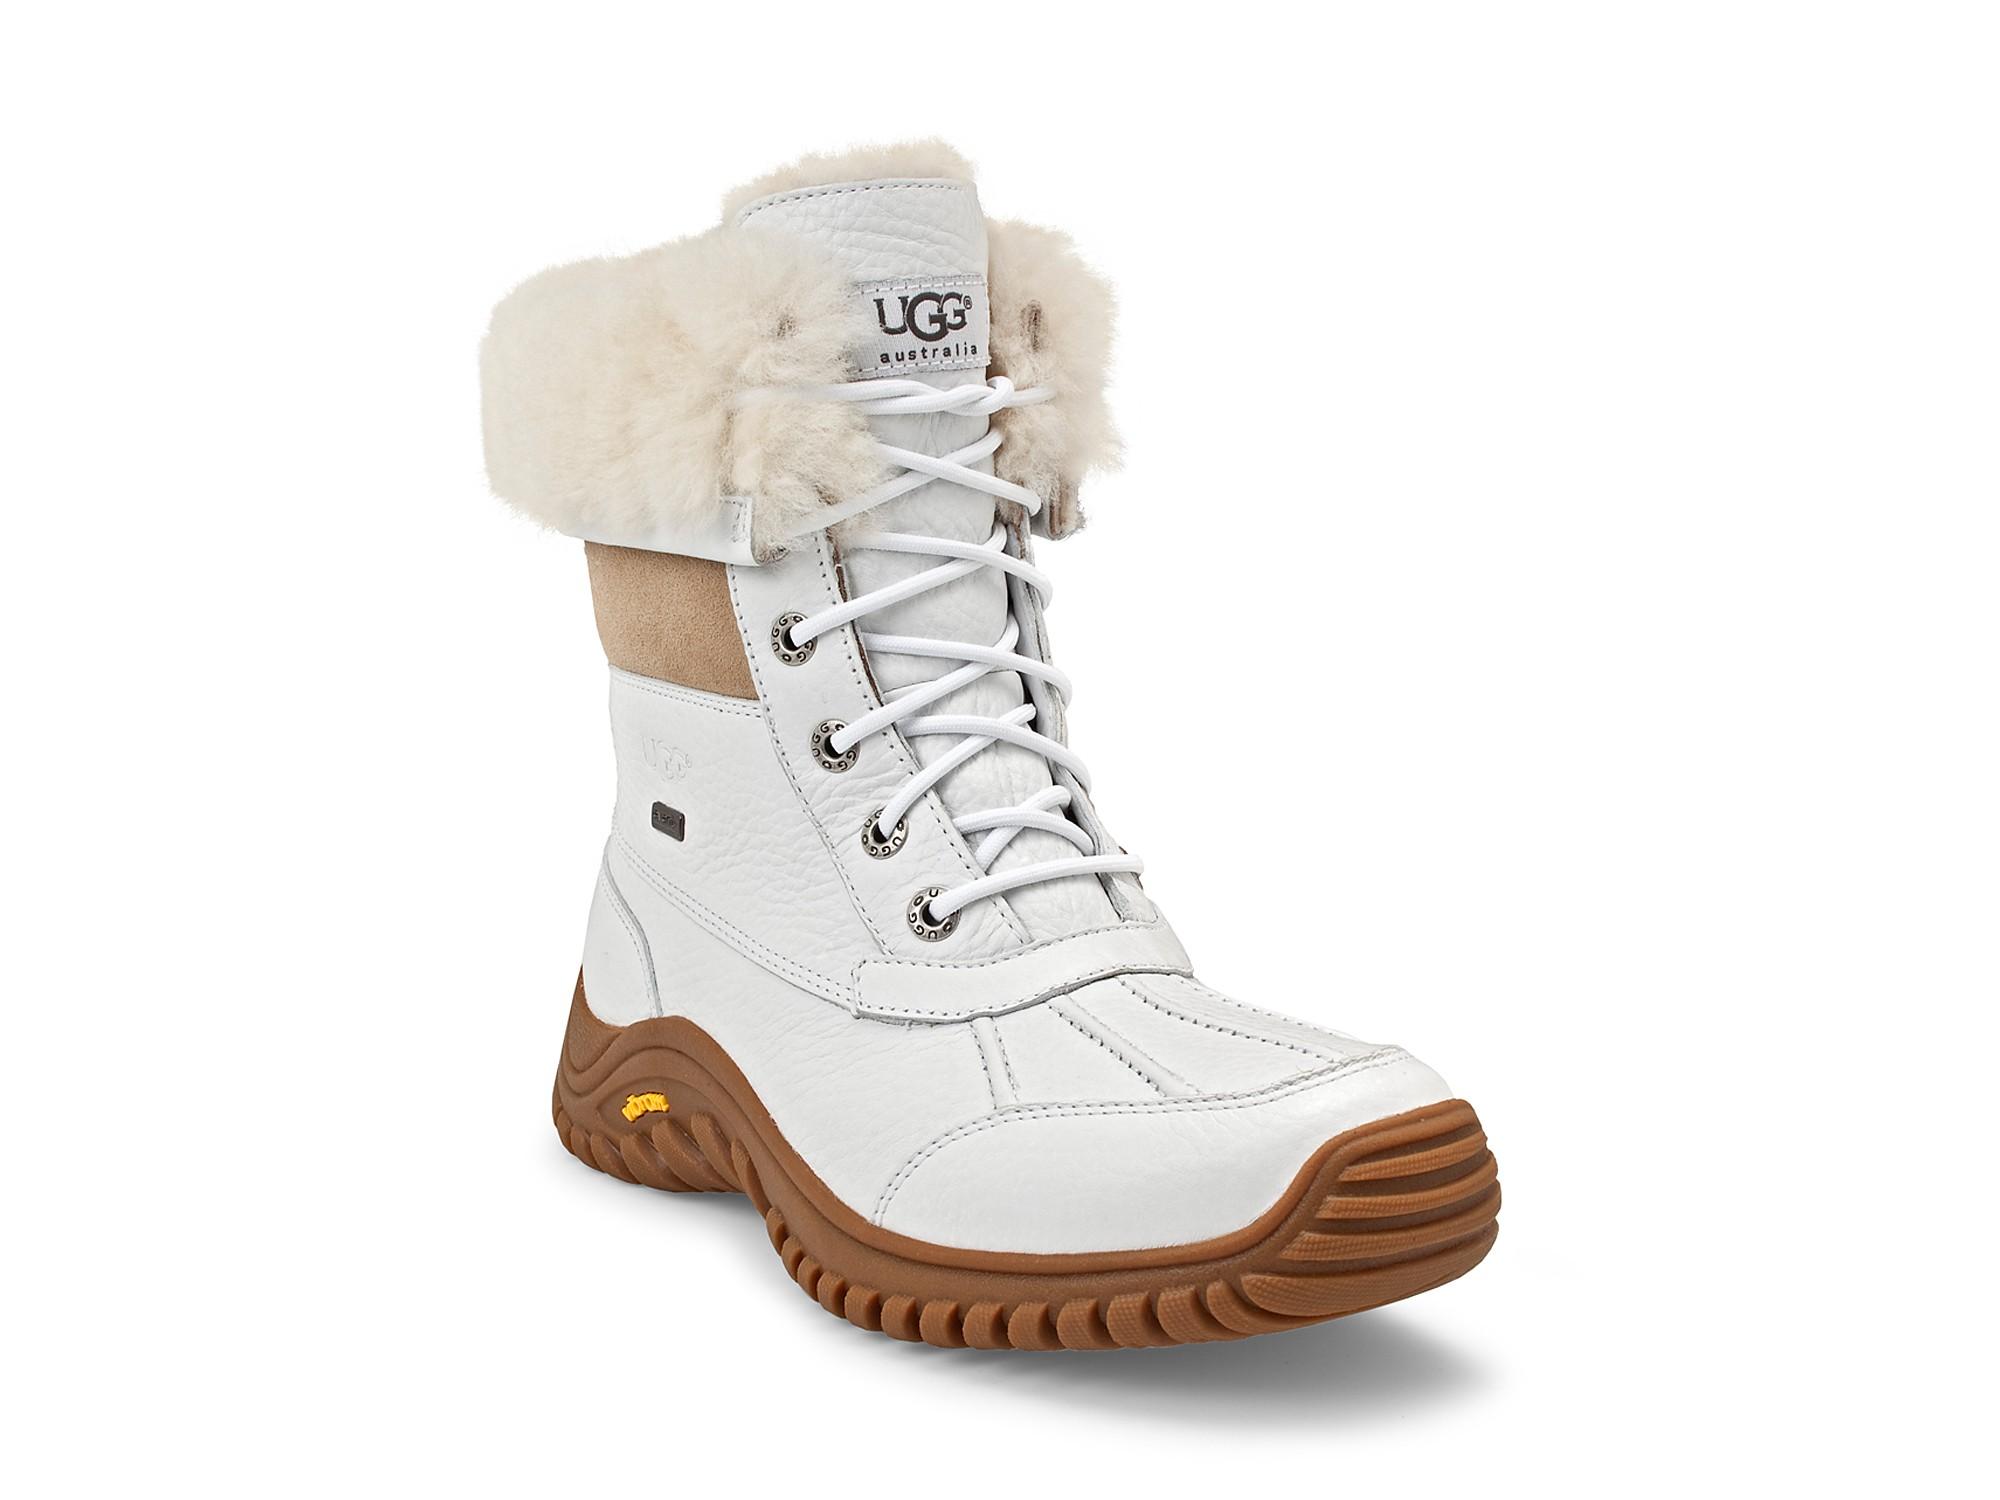 inexpensive lyst ugg adirondak snow boots in white b0f7f 5b55c 8ee30c9c29e2a